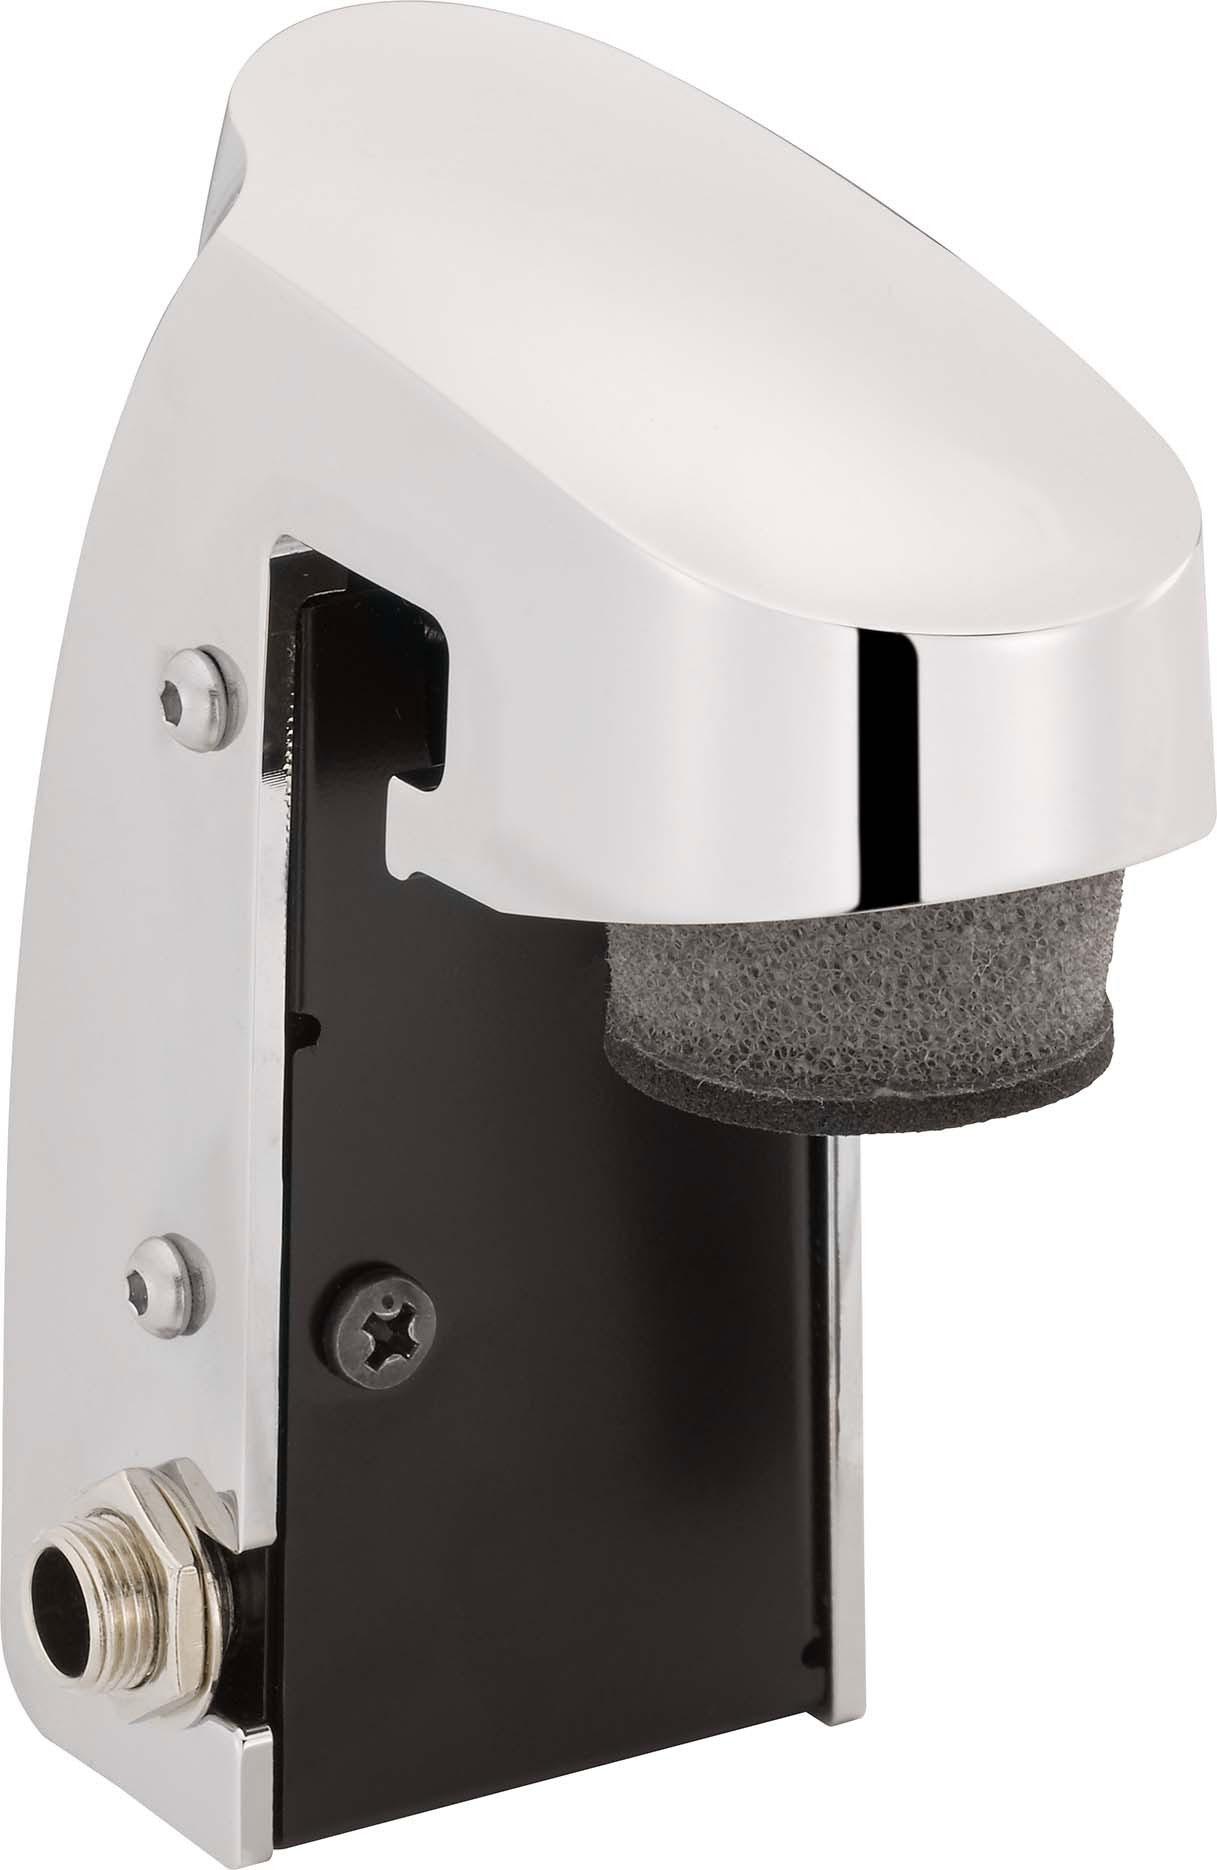 yamaha dt50s snare tom drum trigger with head rim pickups solid die cast metal body chrome. Black Bedroom Furniture Sets. Home Design Ideas